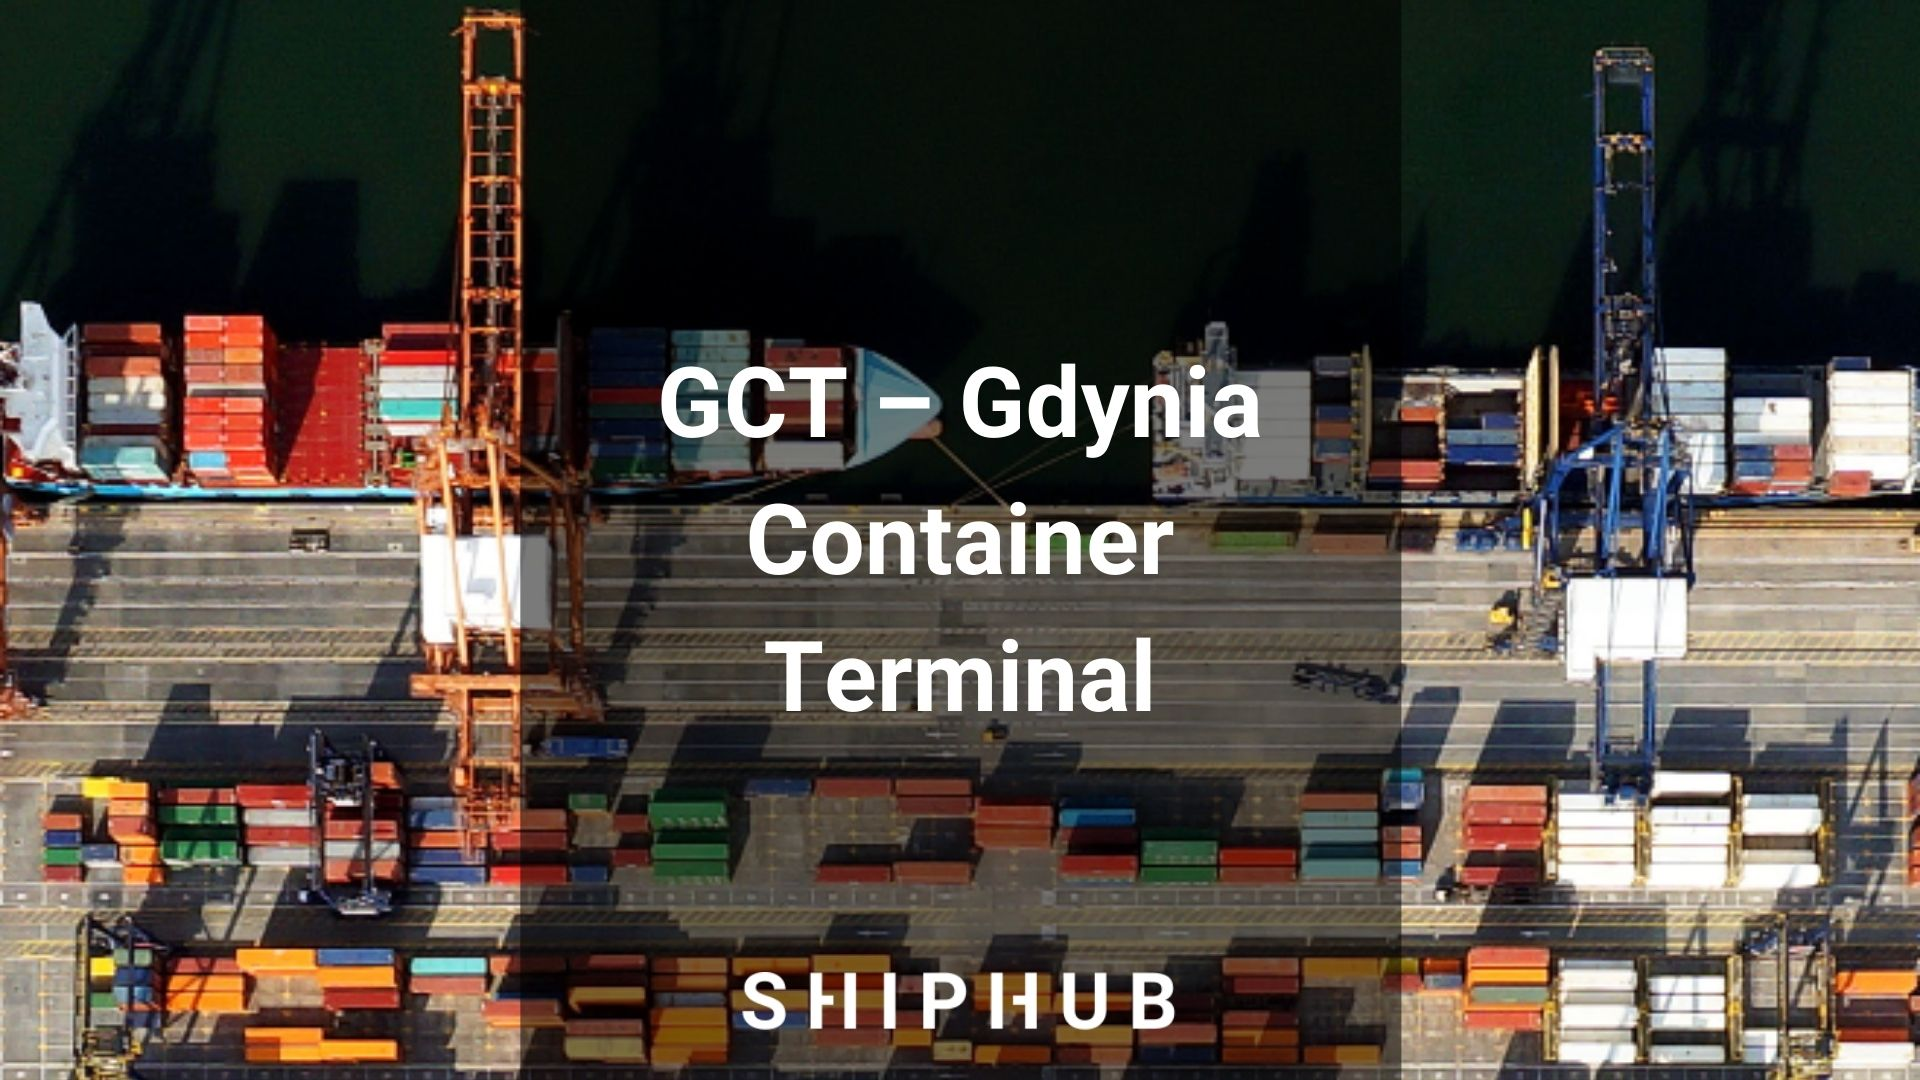 GCT - Gdynia Container Terminal